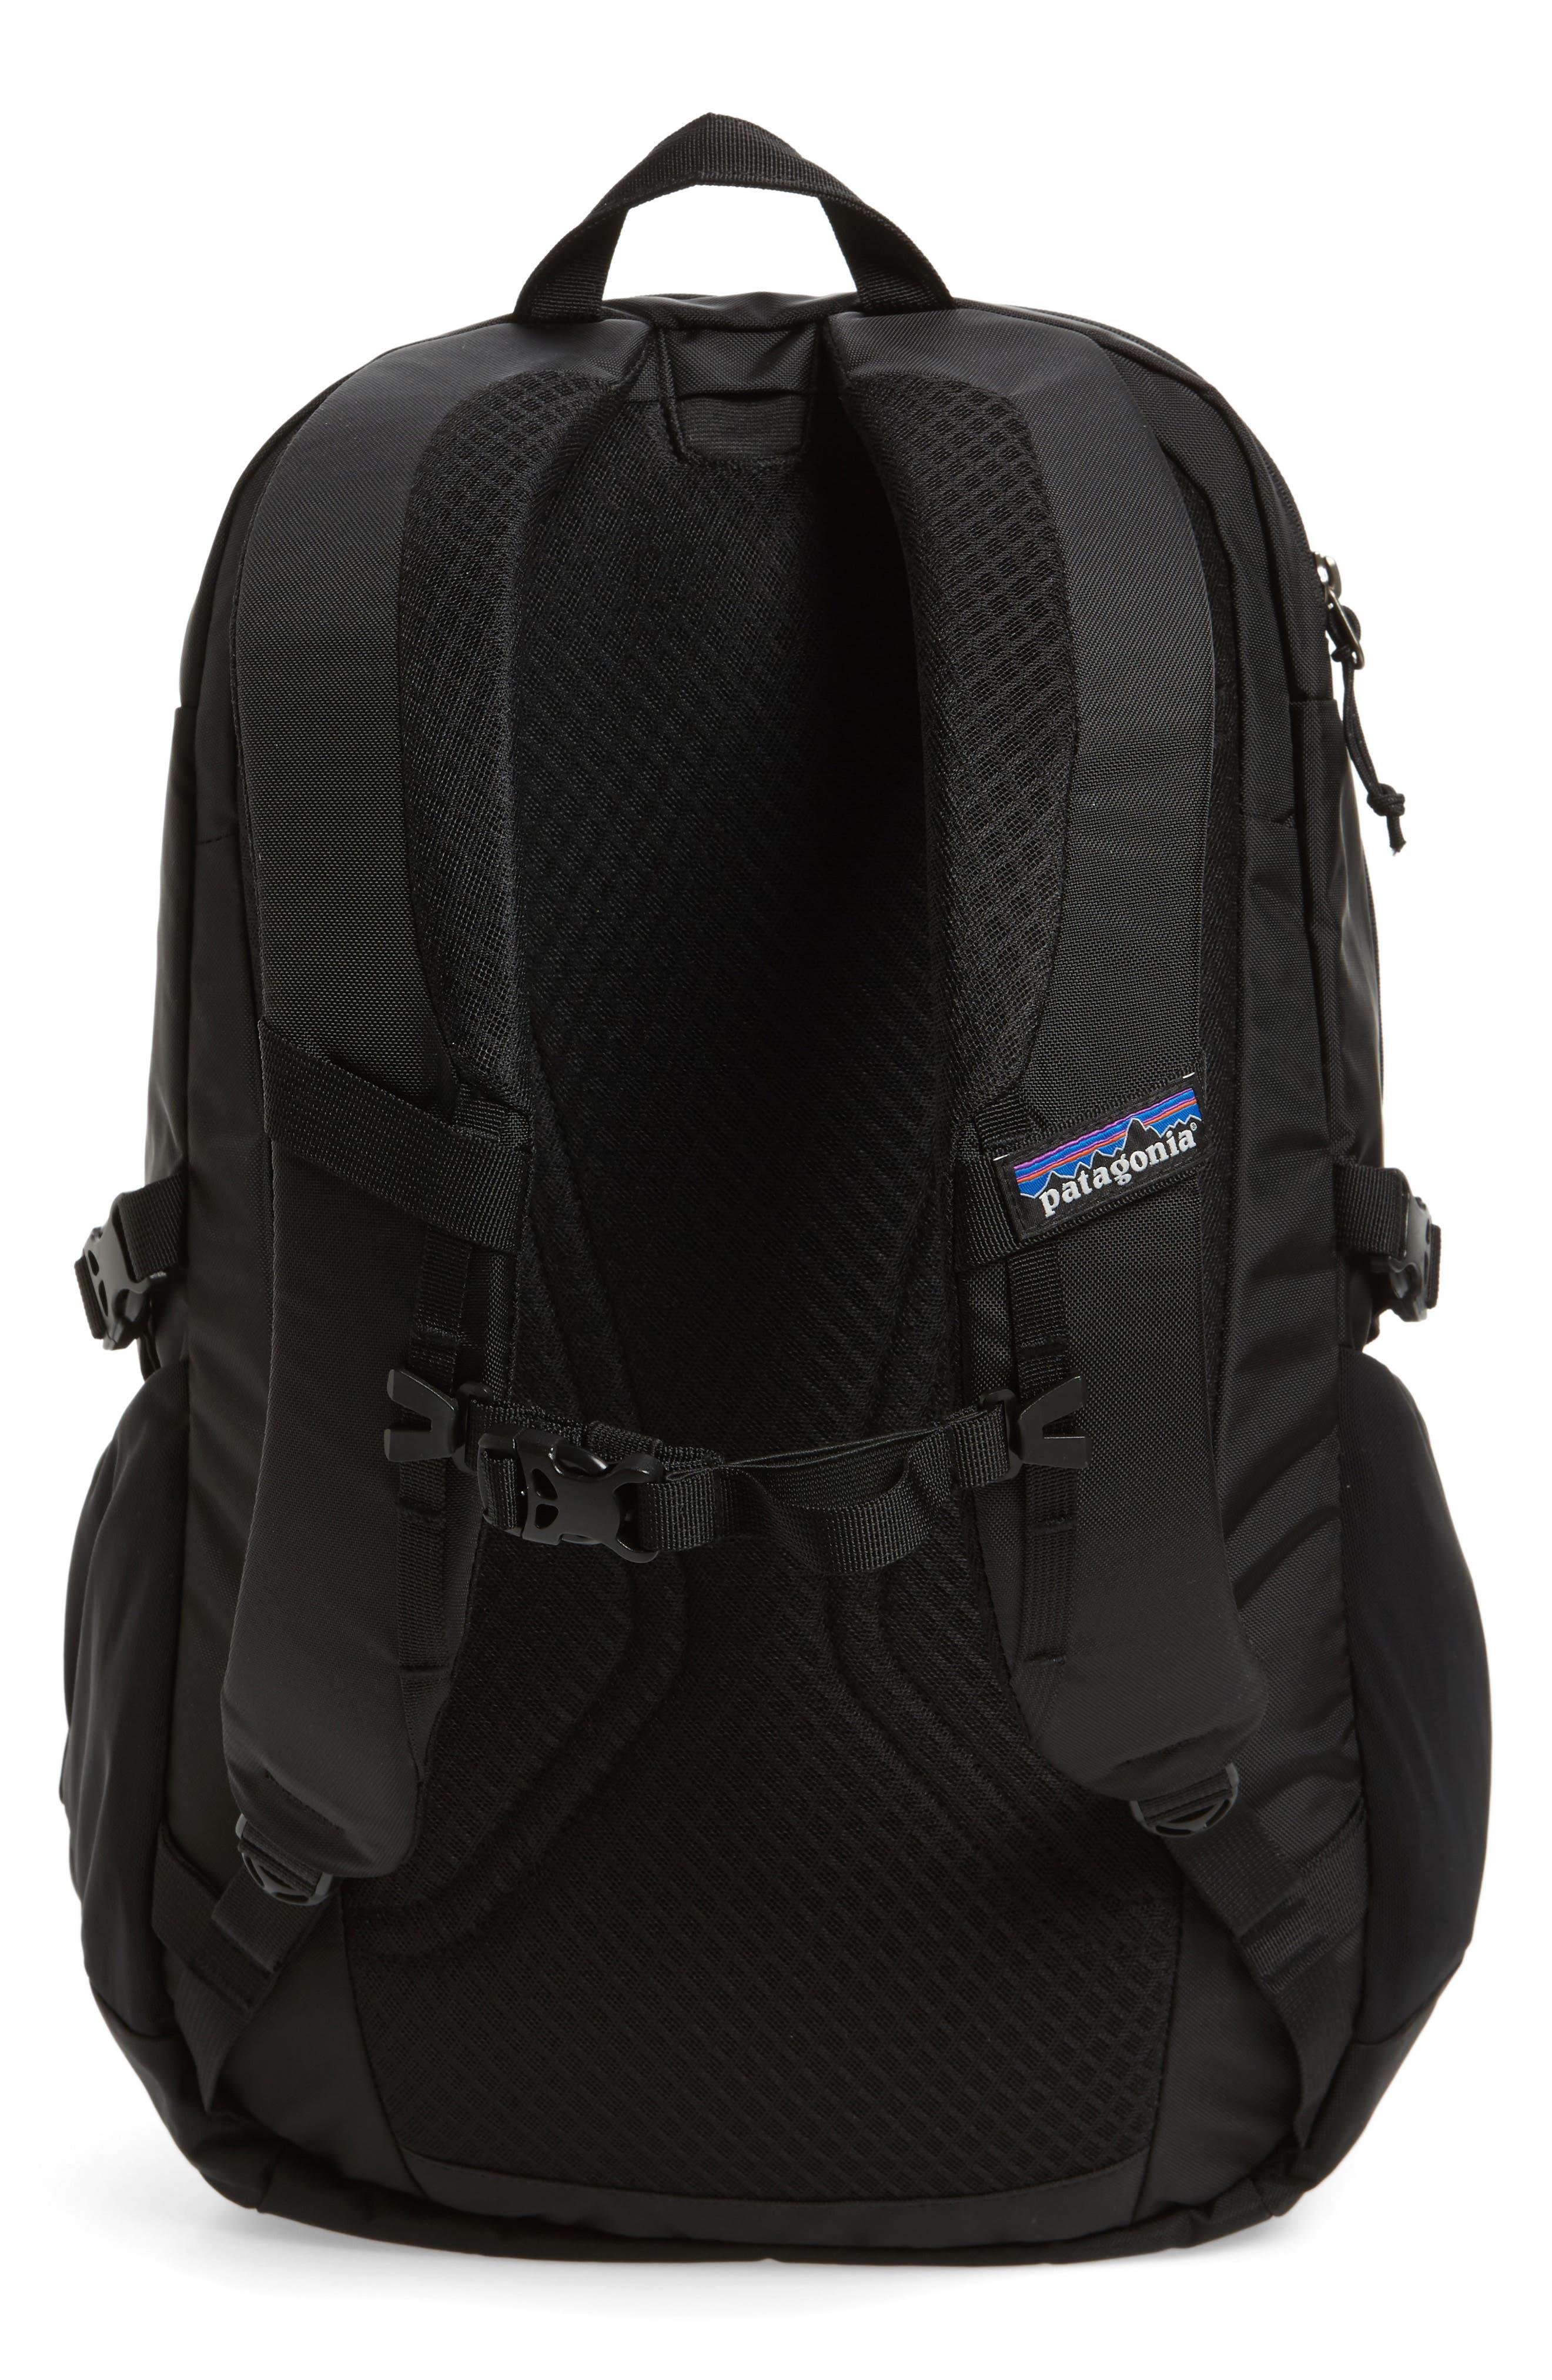 30L Chacabuco Backpack,                             Alternate thumbnail 3, color,                             BLACK